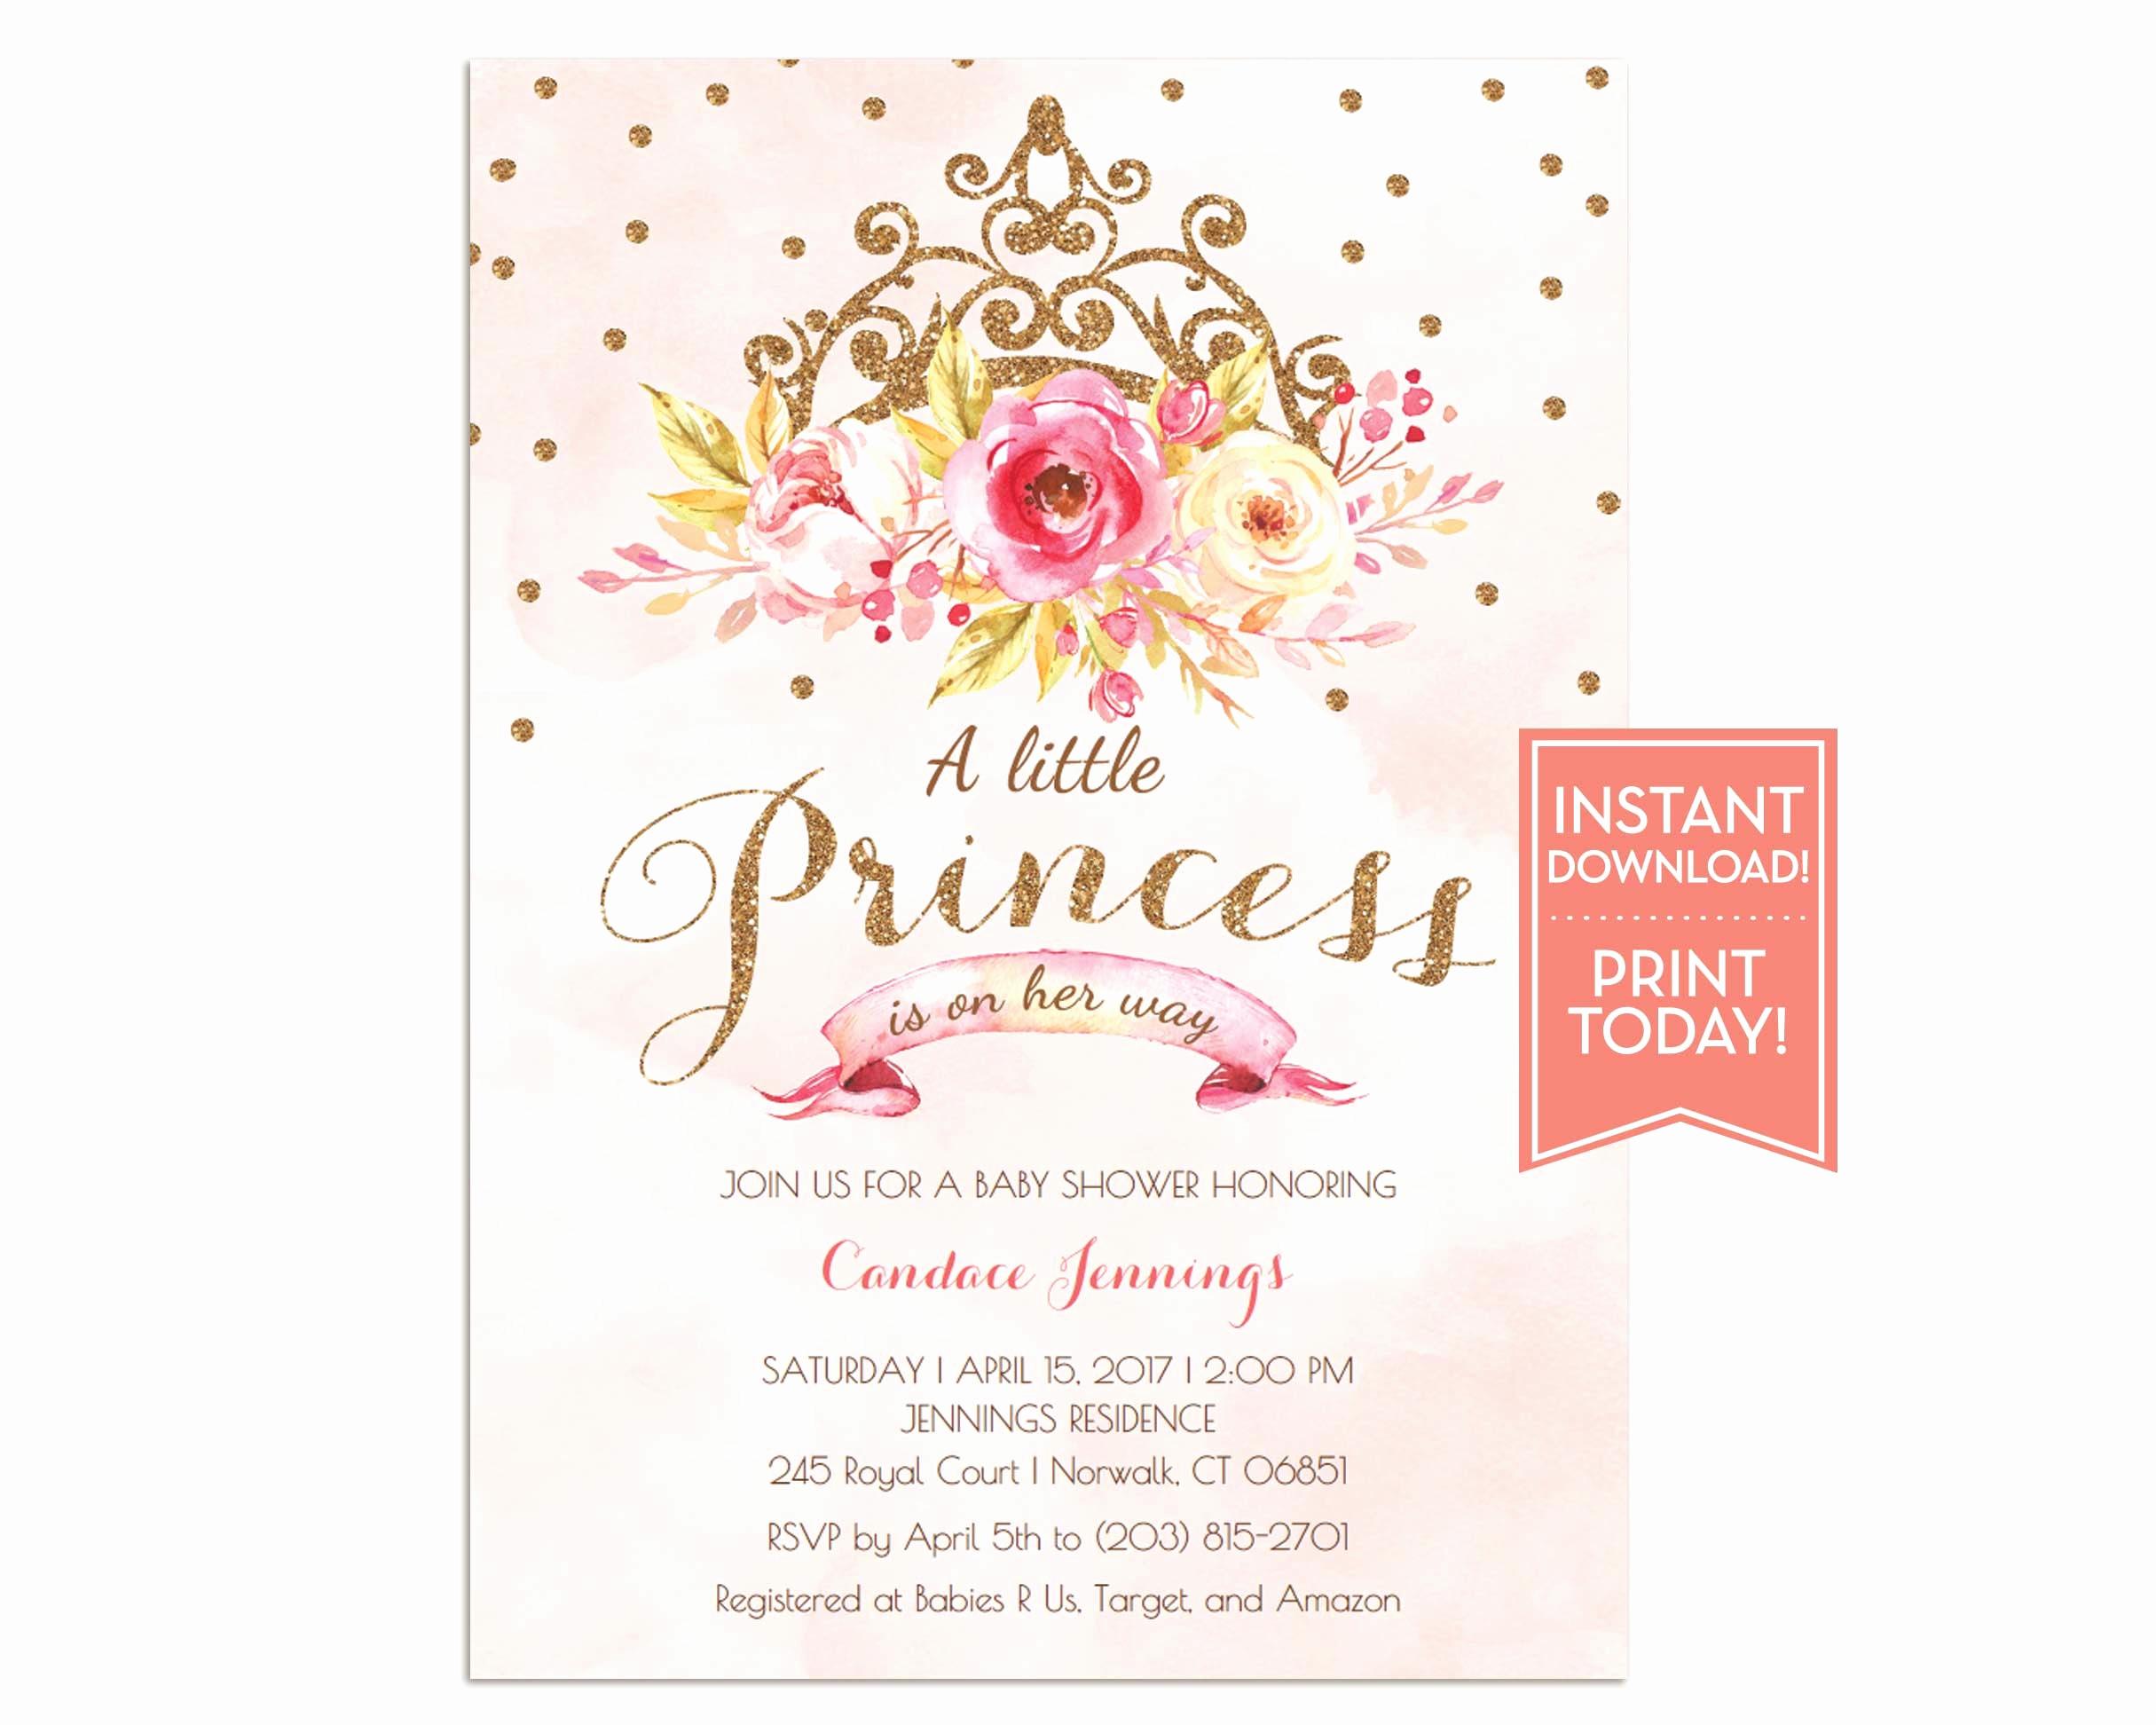 Princess Baby Shower Invitations Lovely Little Princess Baby Shower Invitation Pink Princess Baby